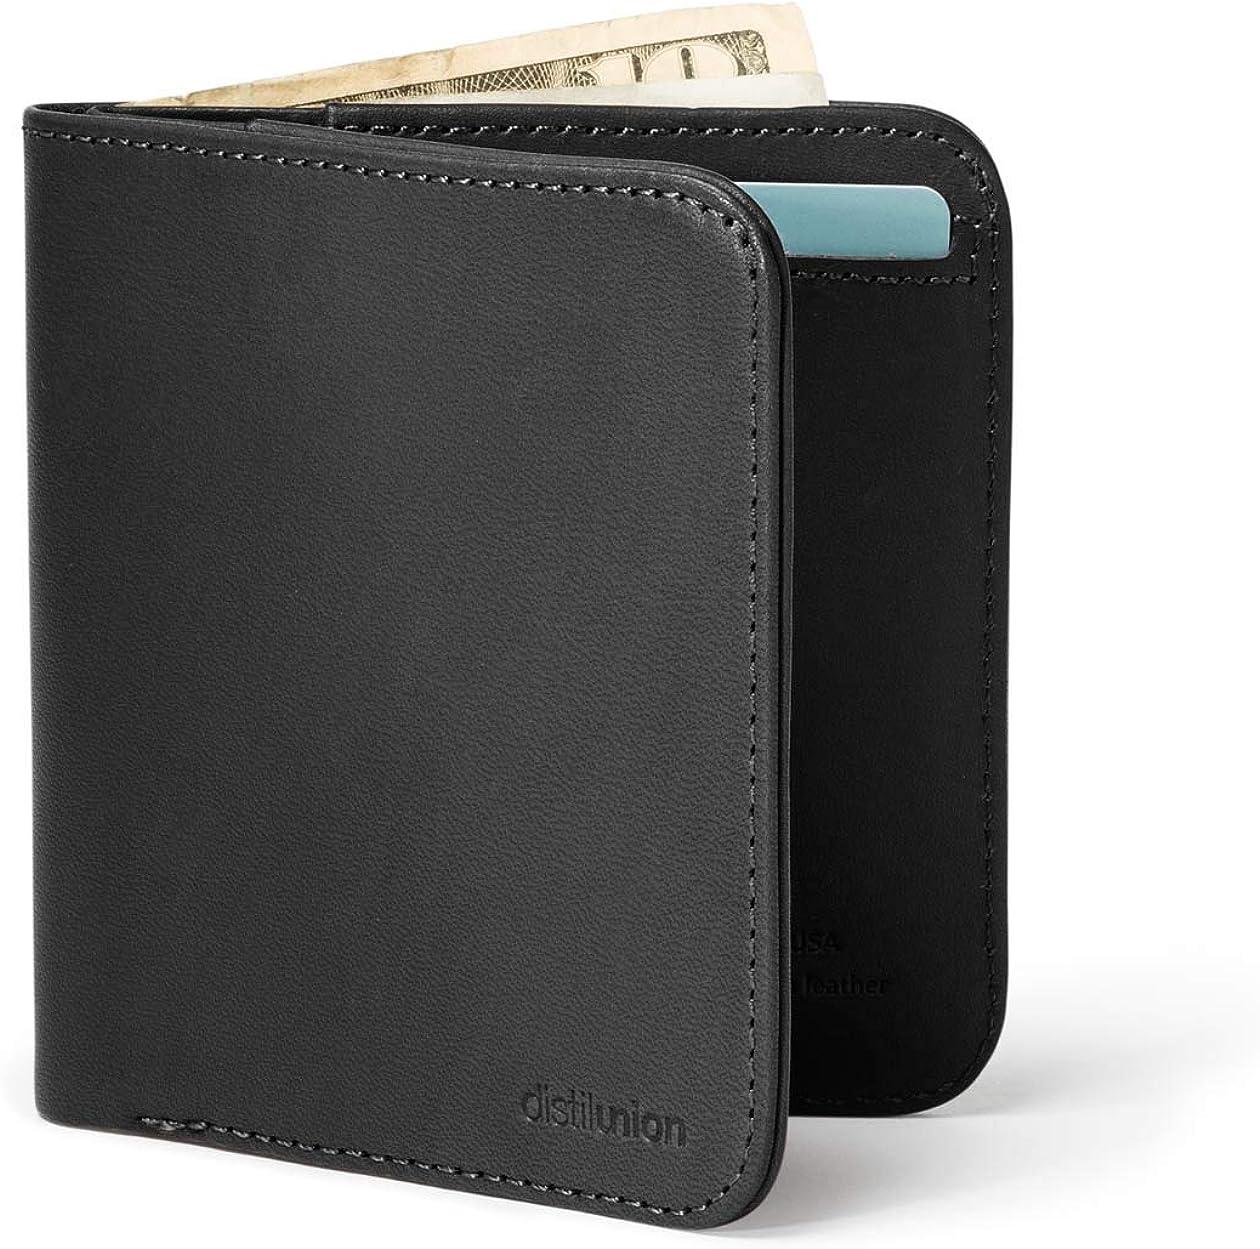 Distil Union Wally Agent Thin Minimalist Bifold Genuine Leather Wallet For Men